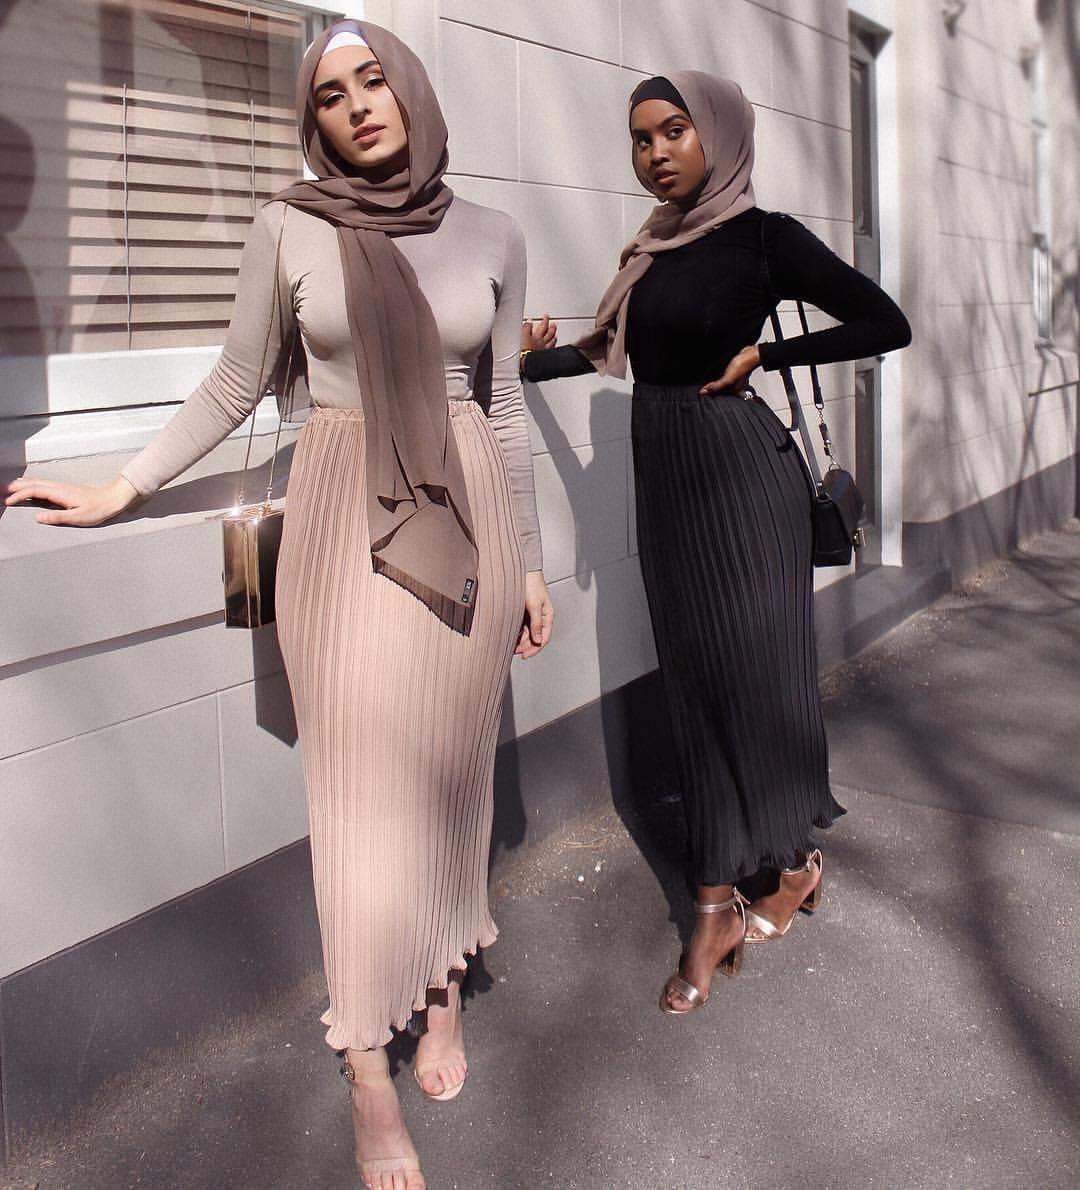 Women Muslim Pencil Long Skirt Chiffon Pleated Skirt Elastic Skirts High Waist UAE Islamic African Clothing Party Maxi Skirts